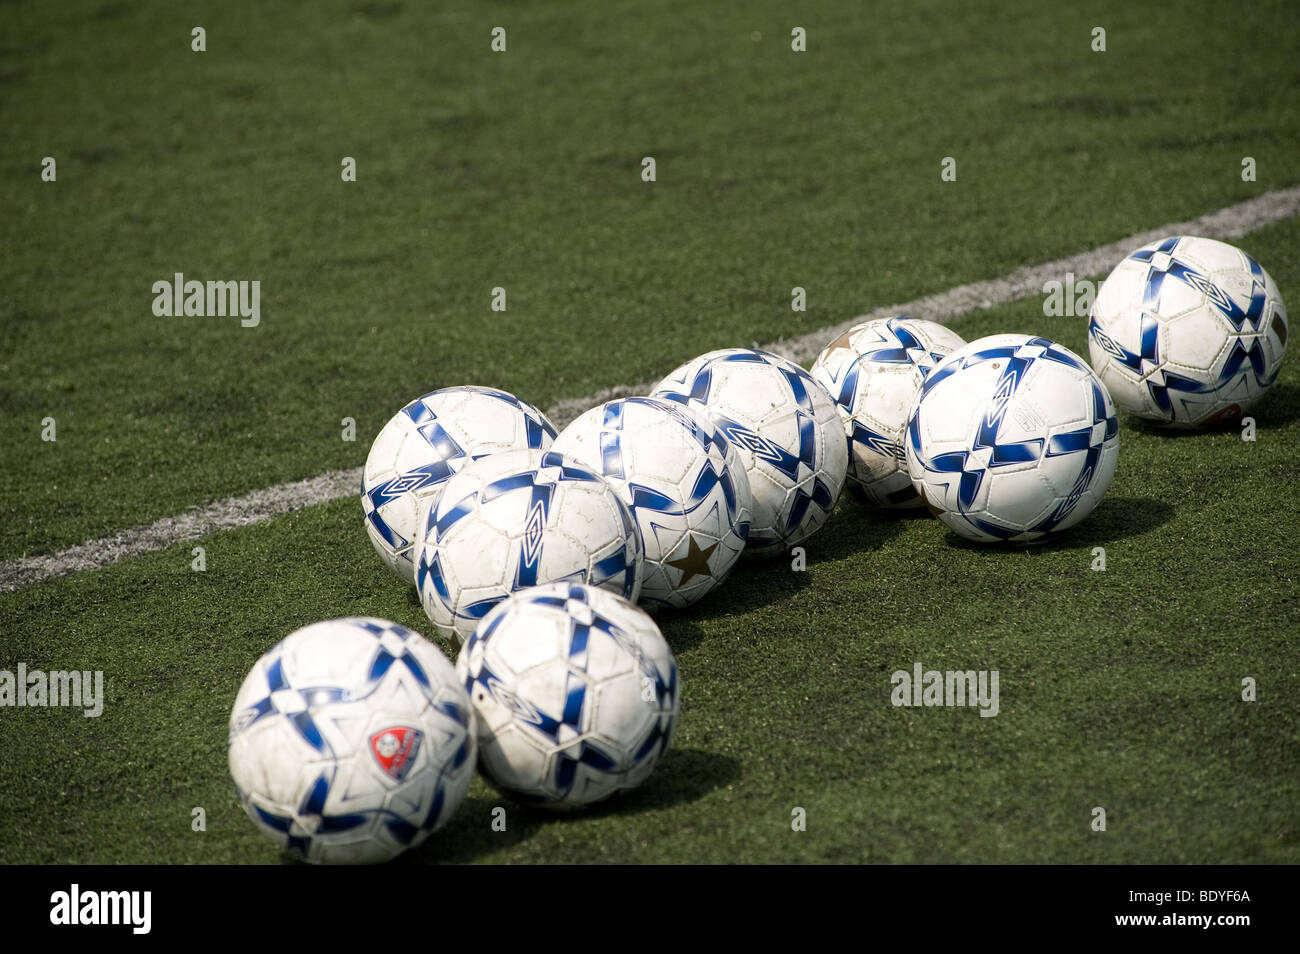 Ballons de football sur un terrain de jeu Banque D'Images